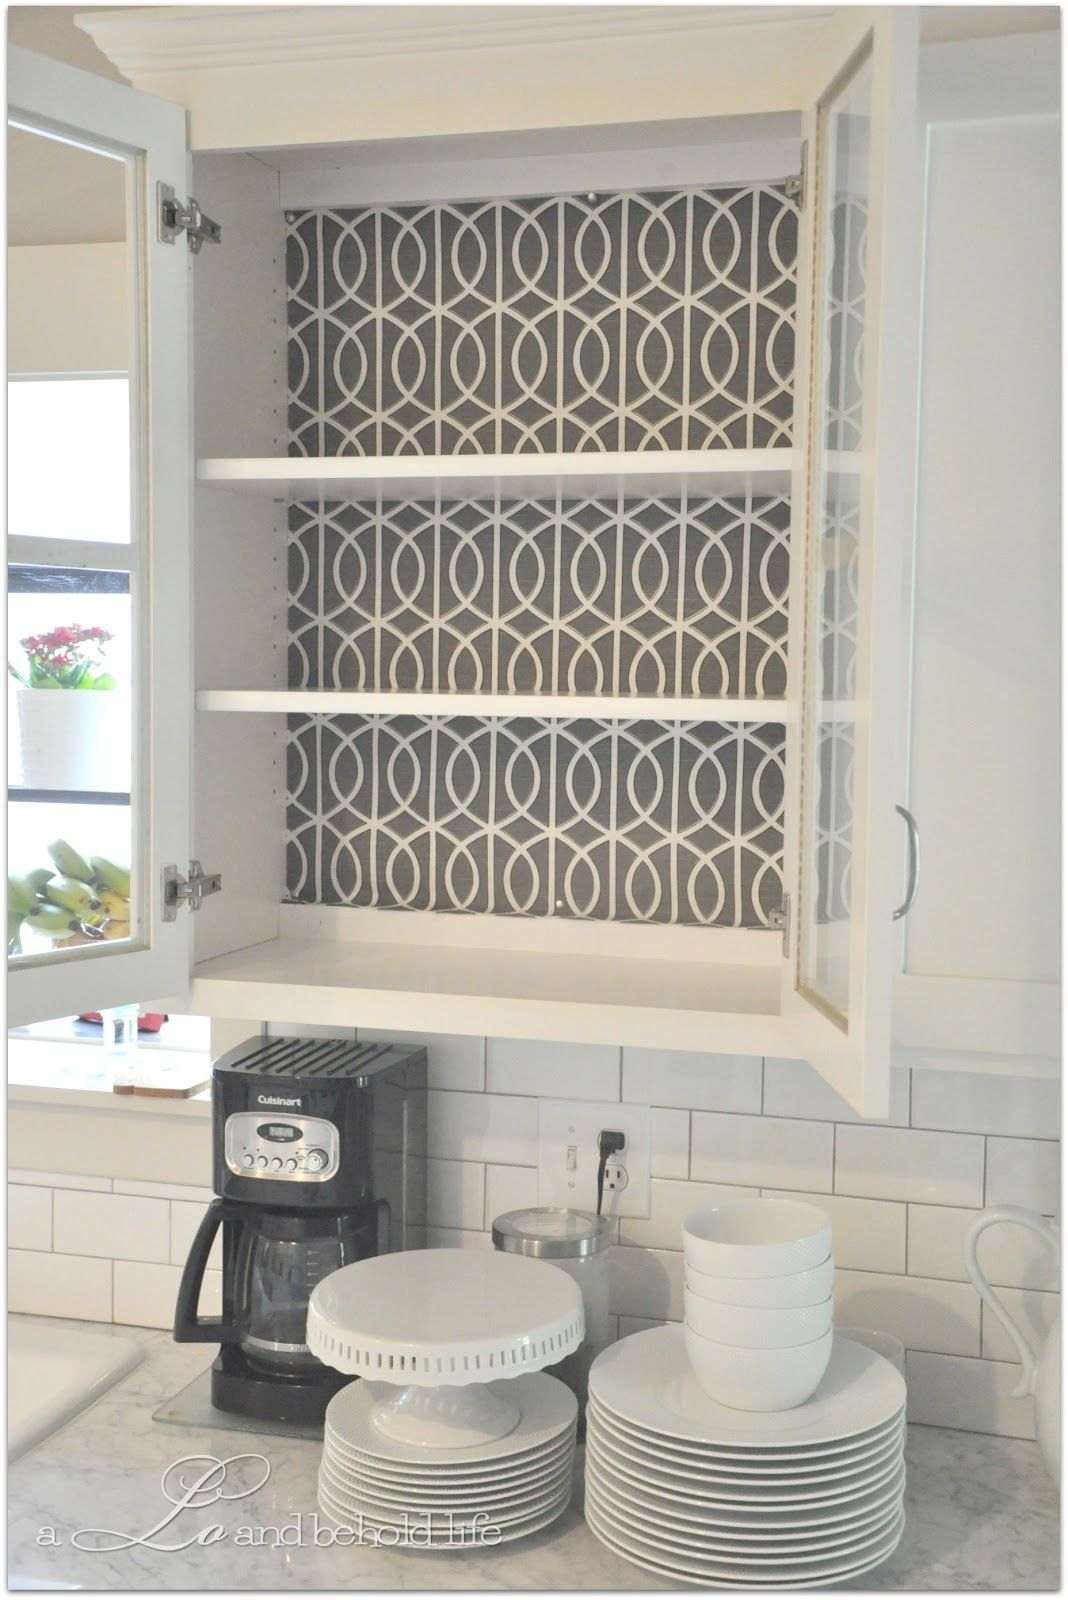 Under cabinet plate rack plans free - Under Cabinet Plate Rack Plans Free 21